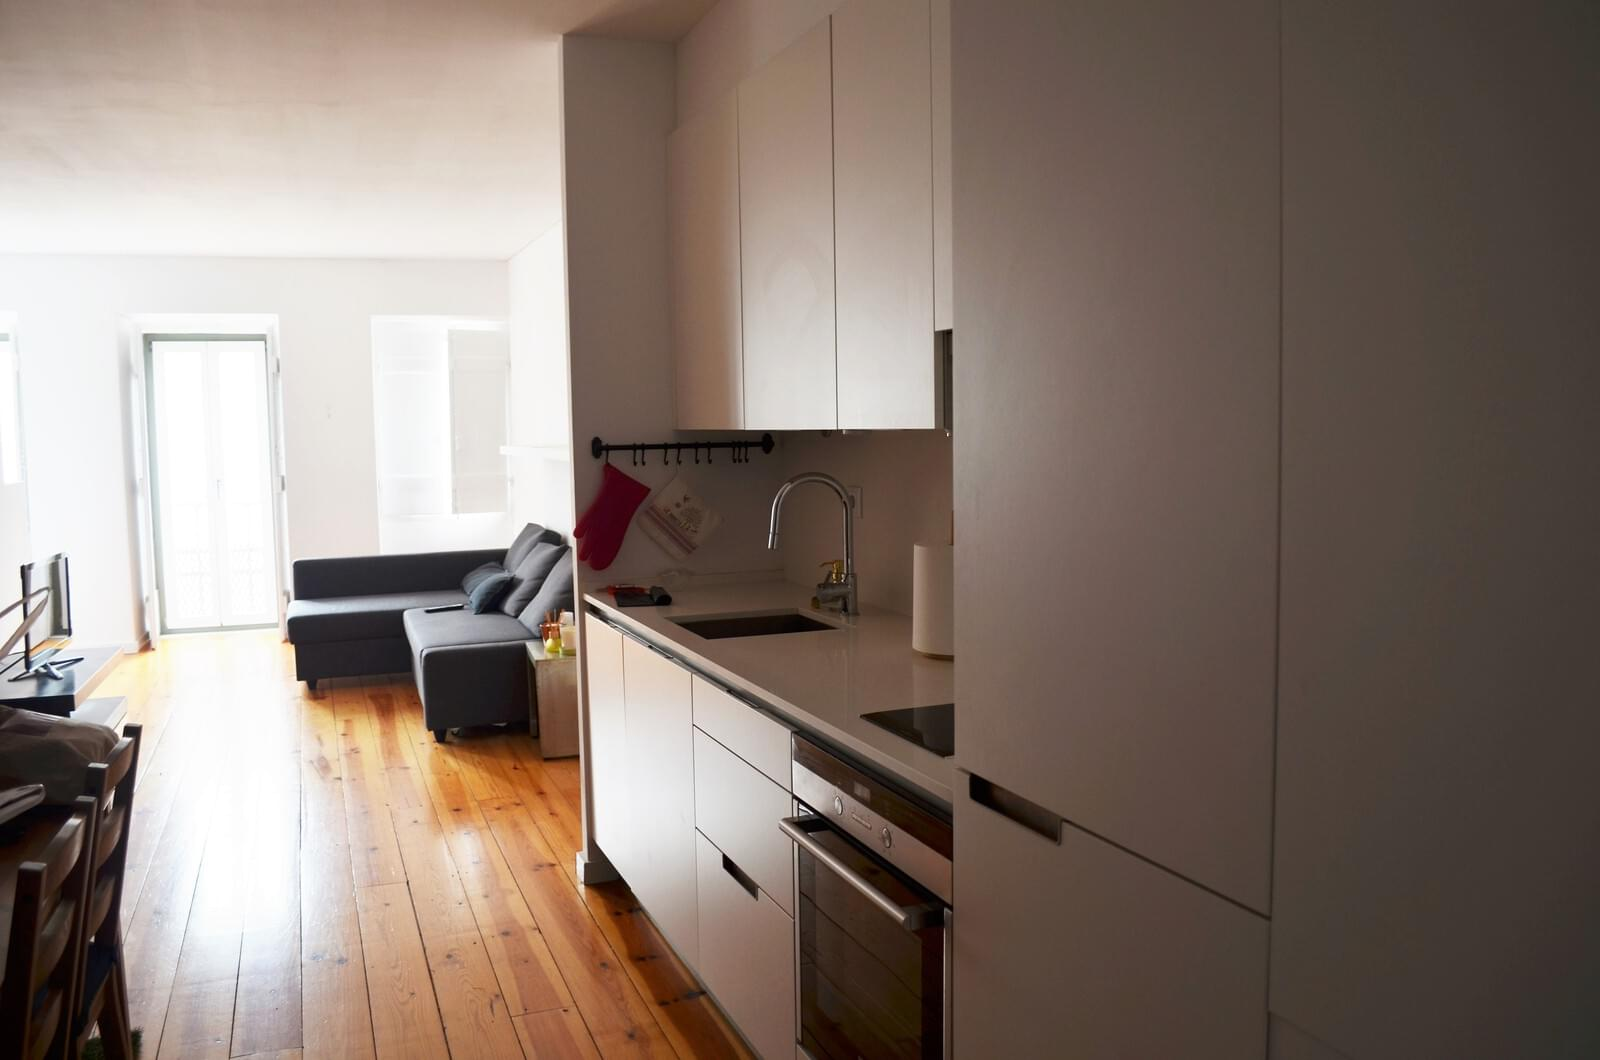 pf17785-apartamento-t1-lisboa-114fef81-96e8-4183-b6eb-05e29e05b1df